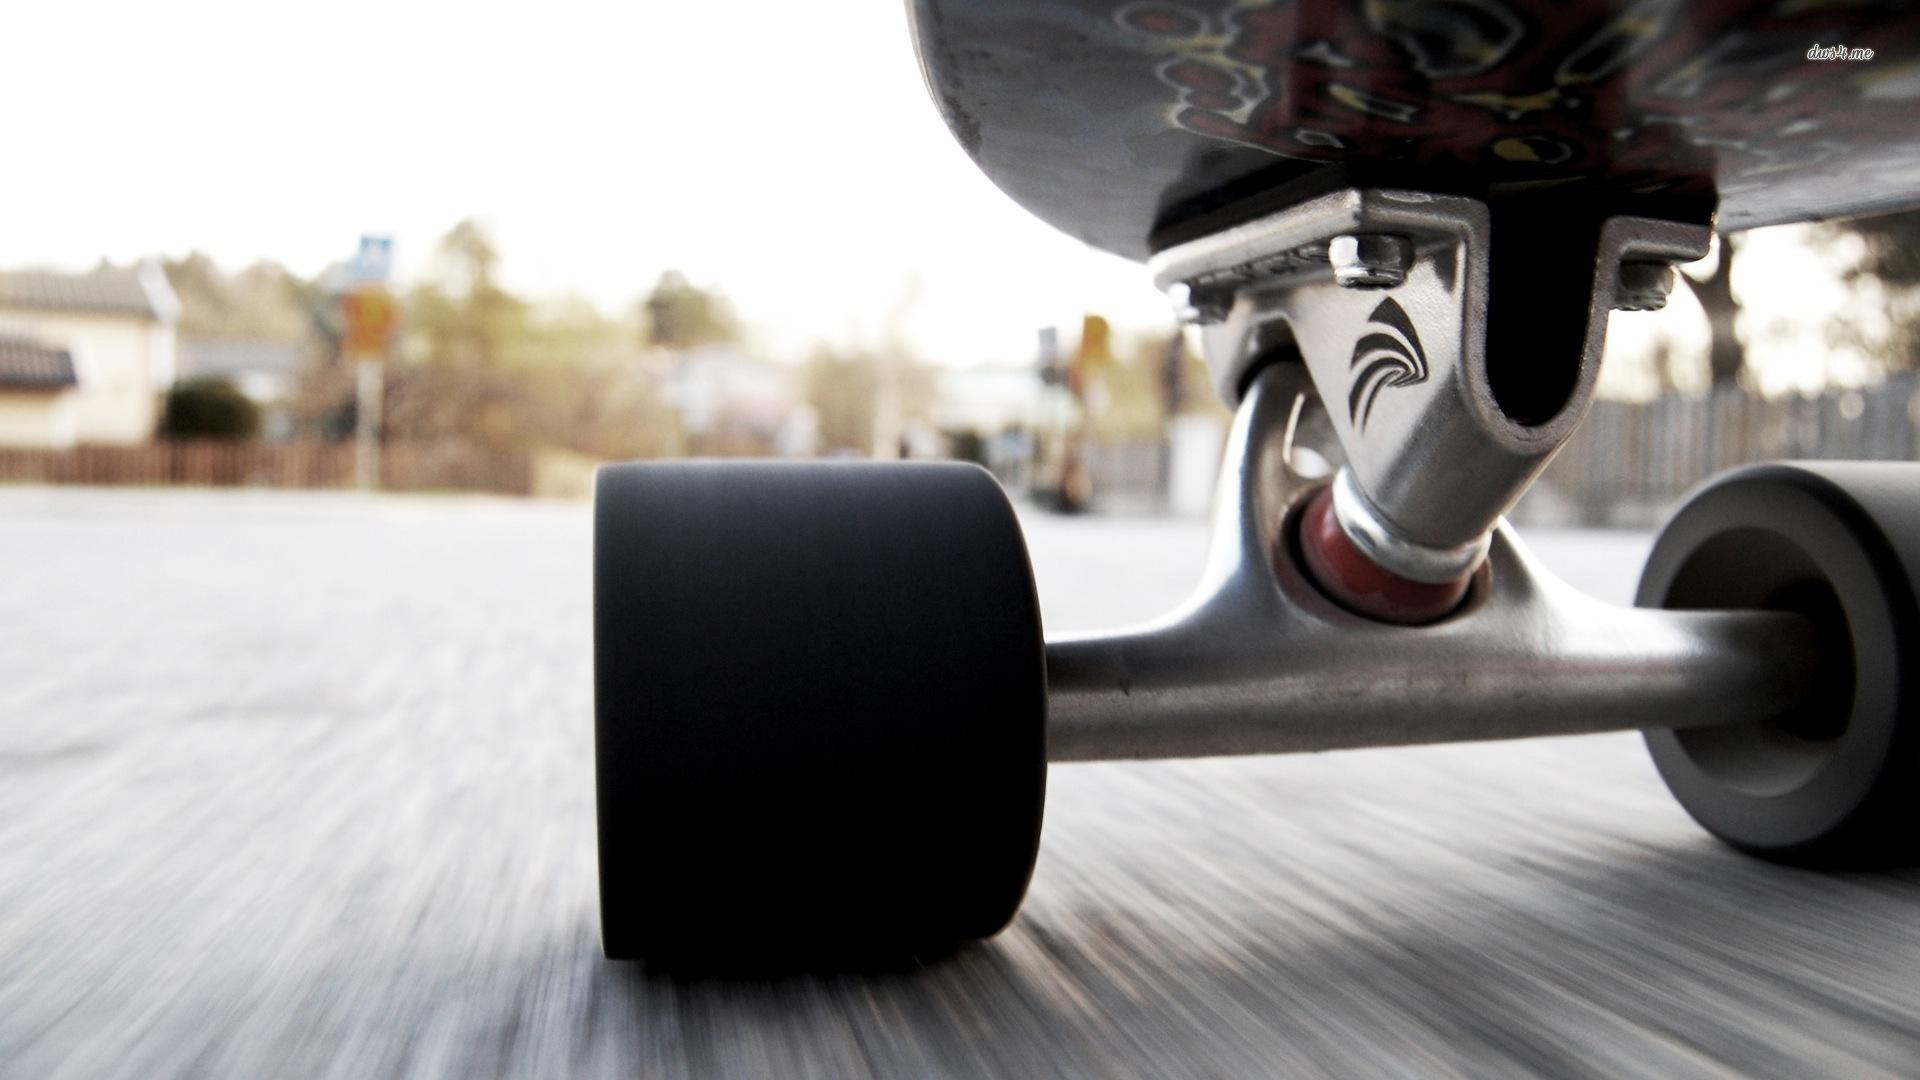 76 Skateboard Wallpaper On Wallpapersafari